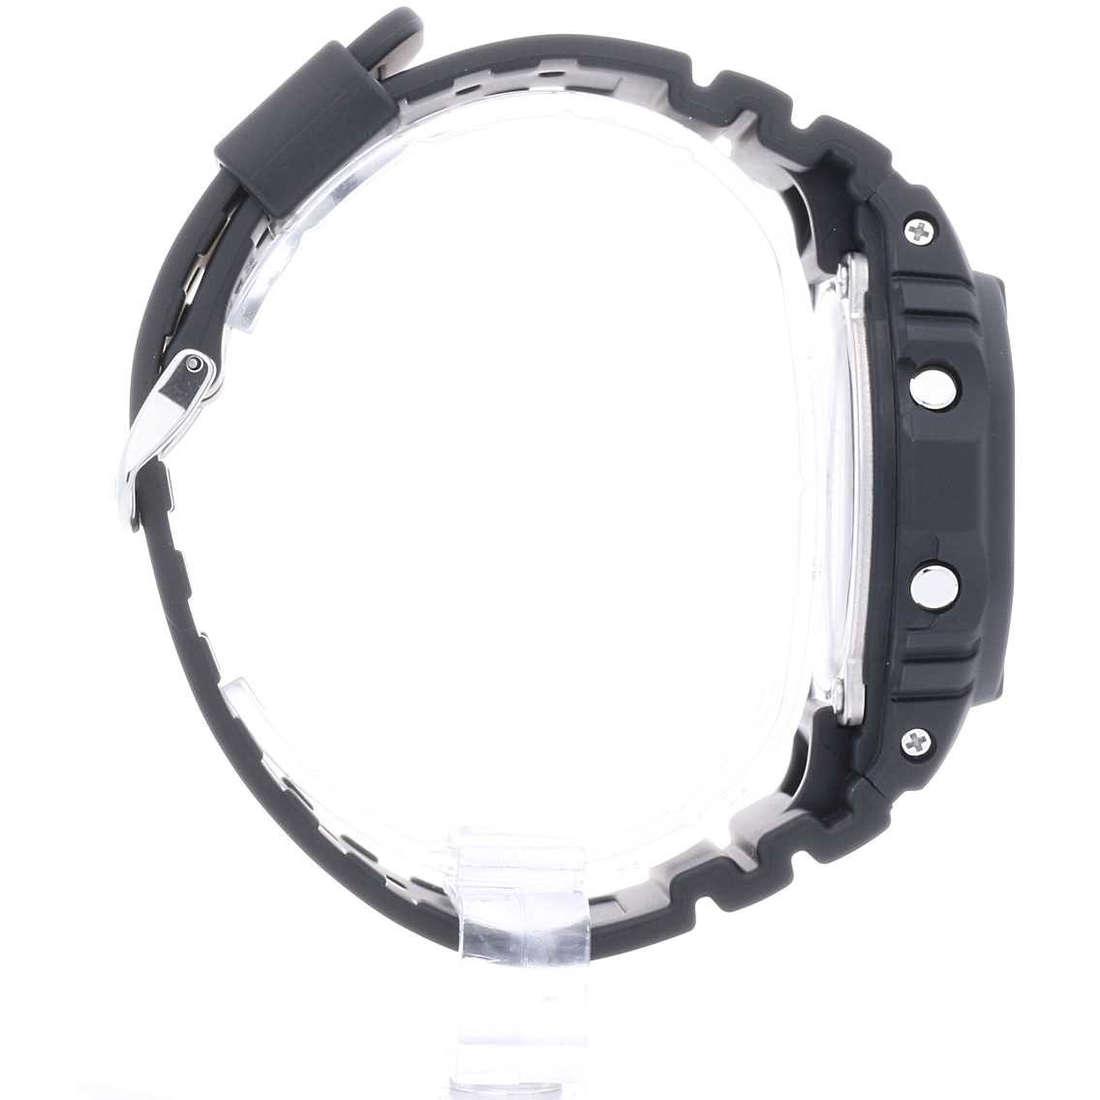 acquista orologi uomo Casio DW-5600E-1VER